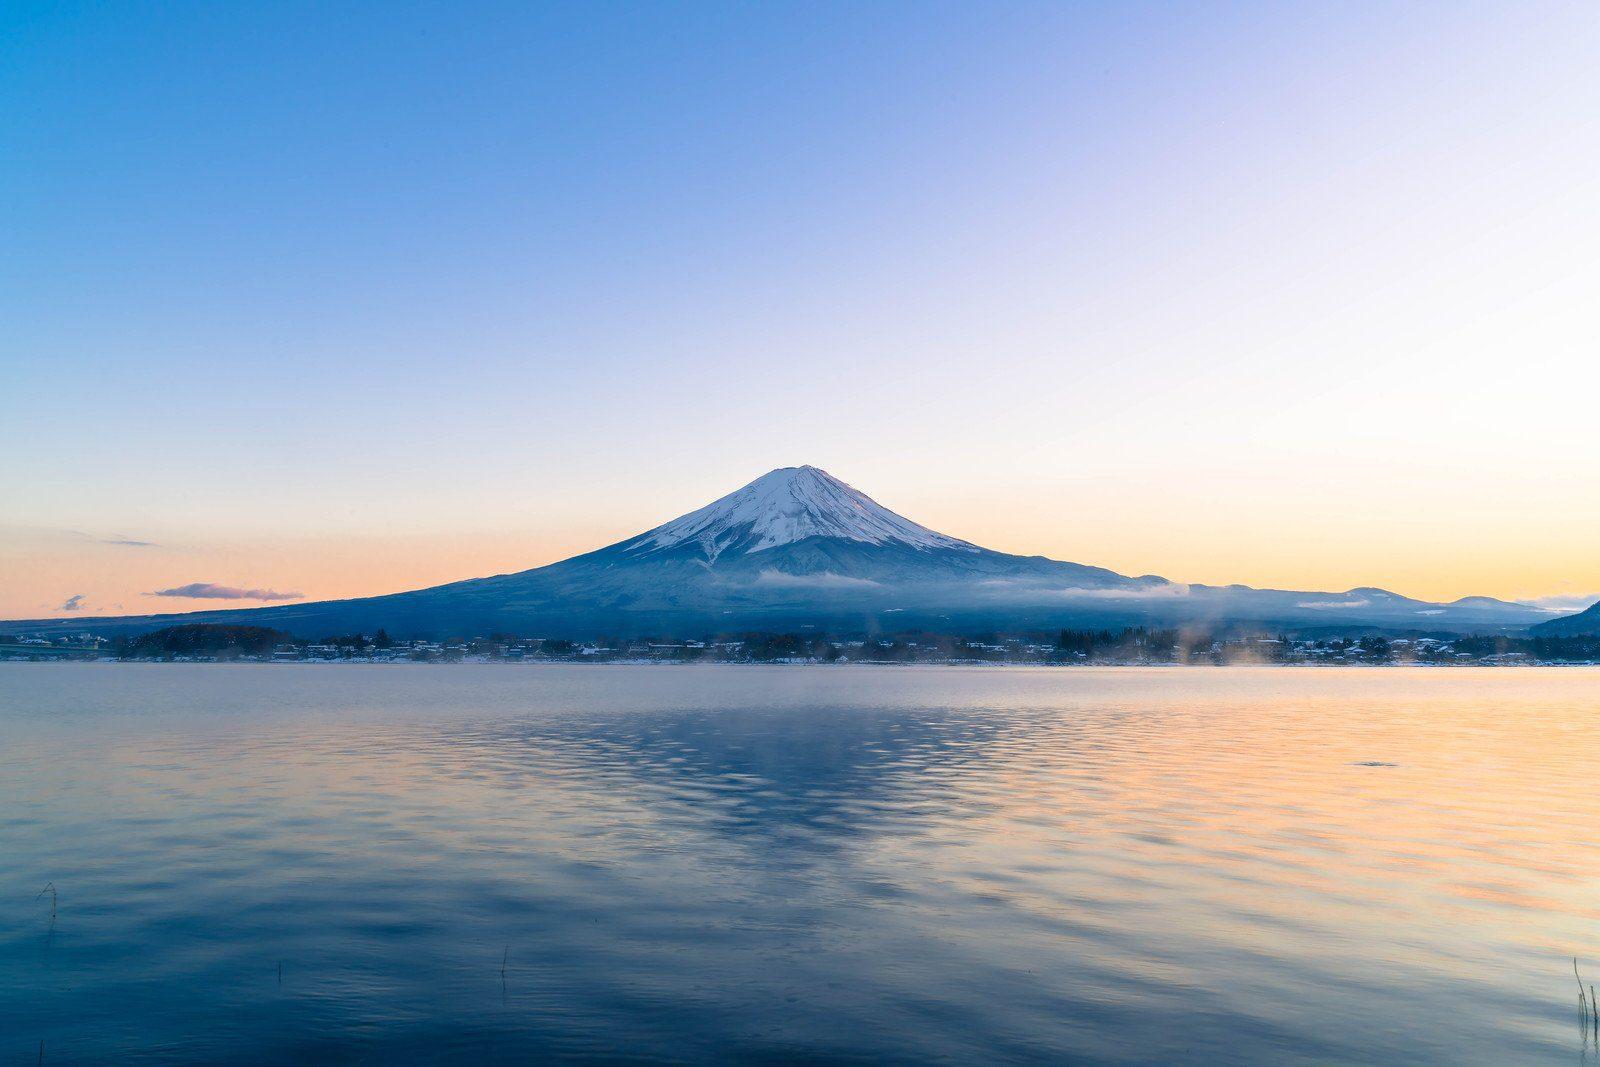 View of Mt Fuji from Lake Kawaguchi in the Five Lakes Region